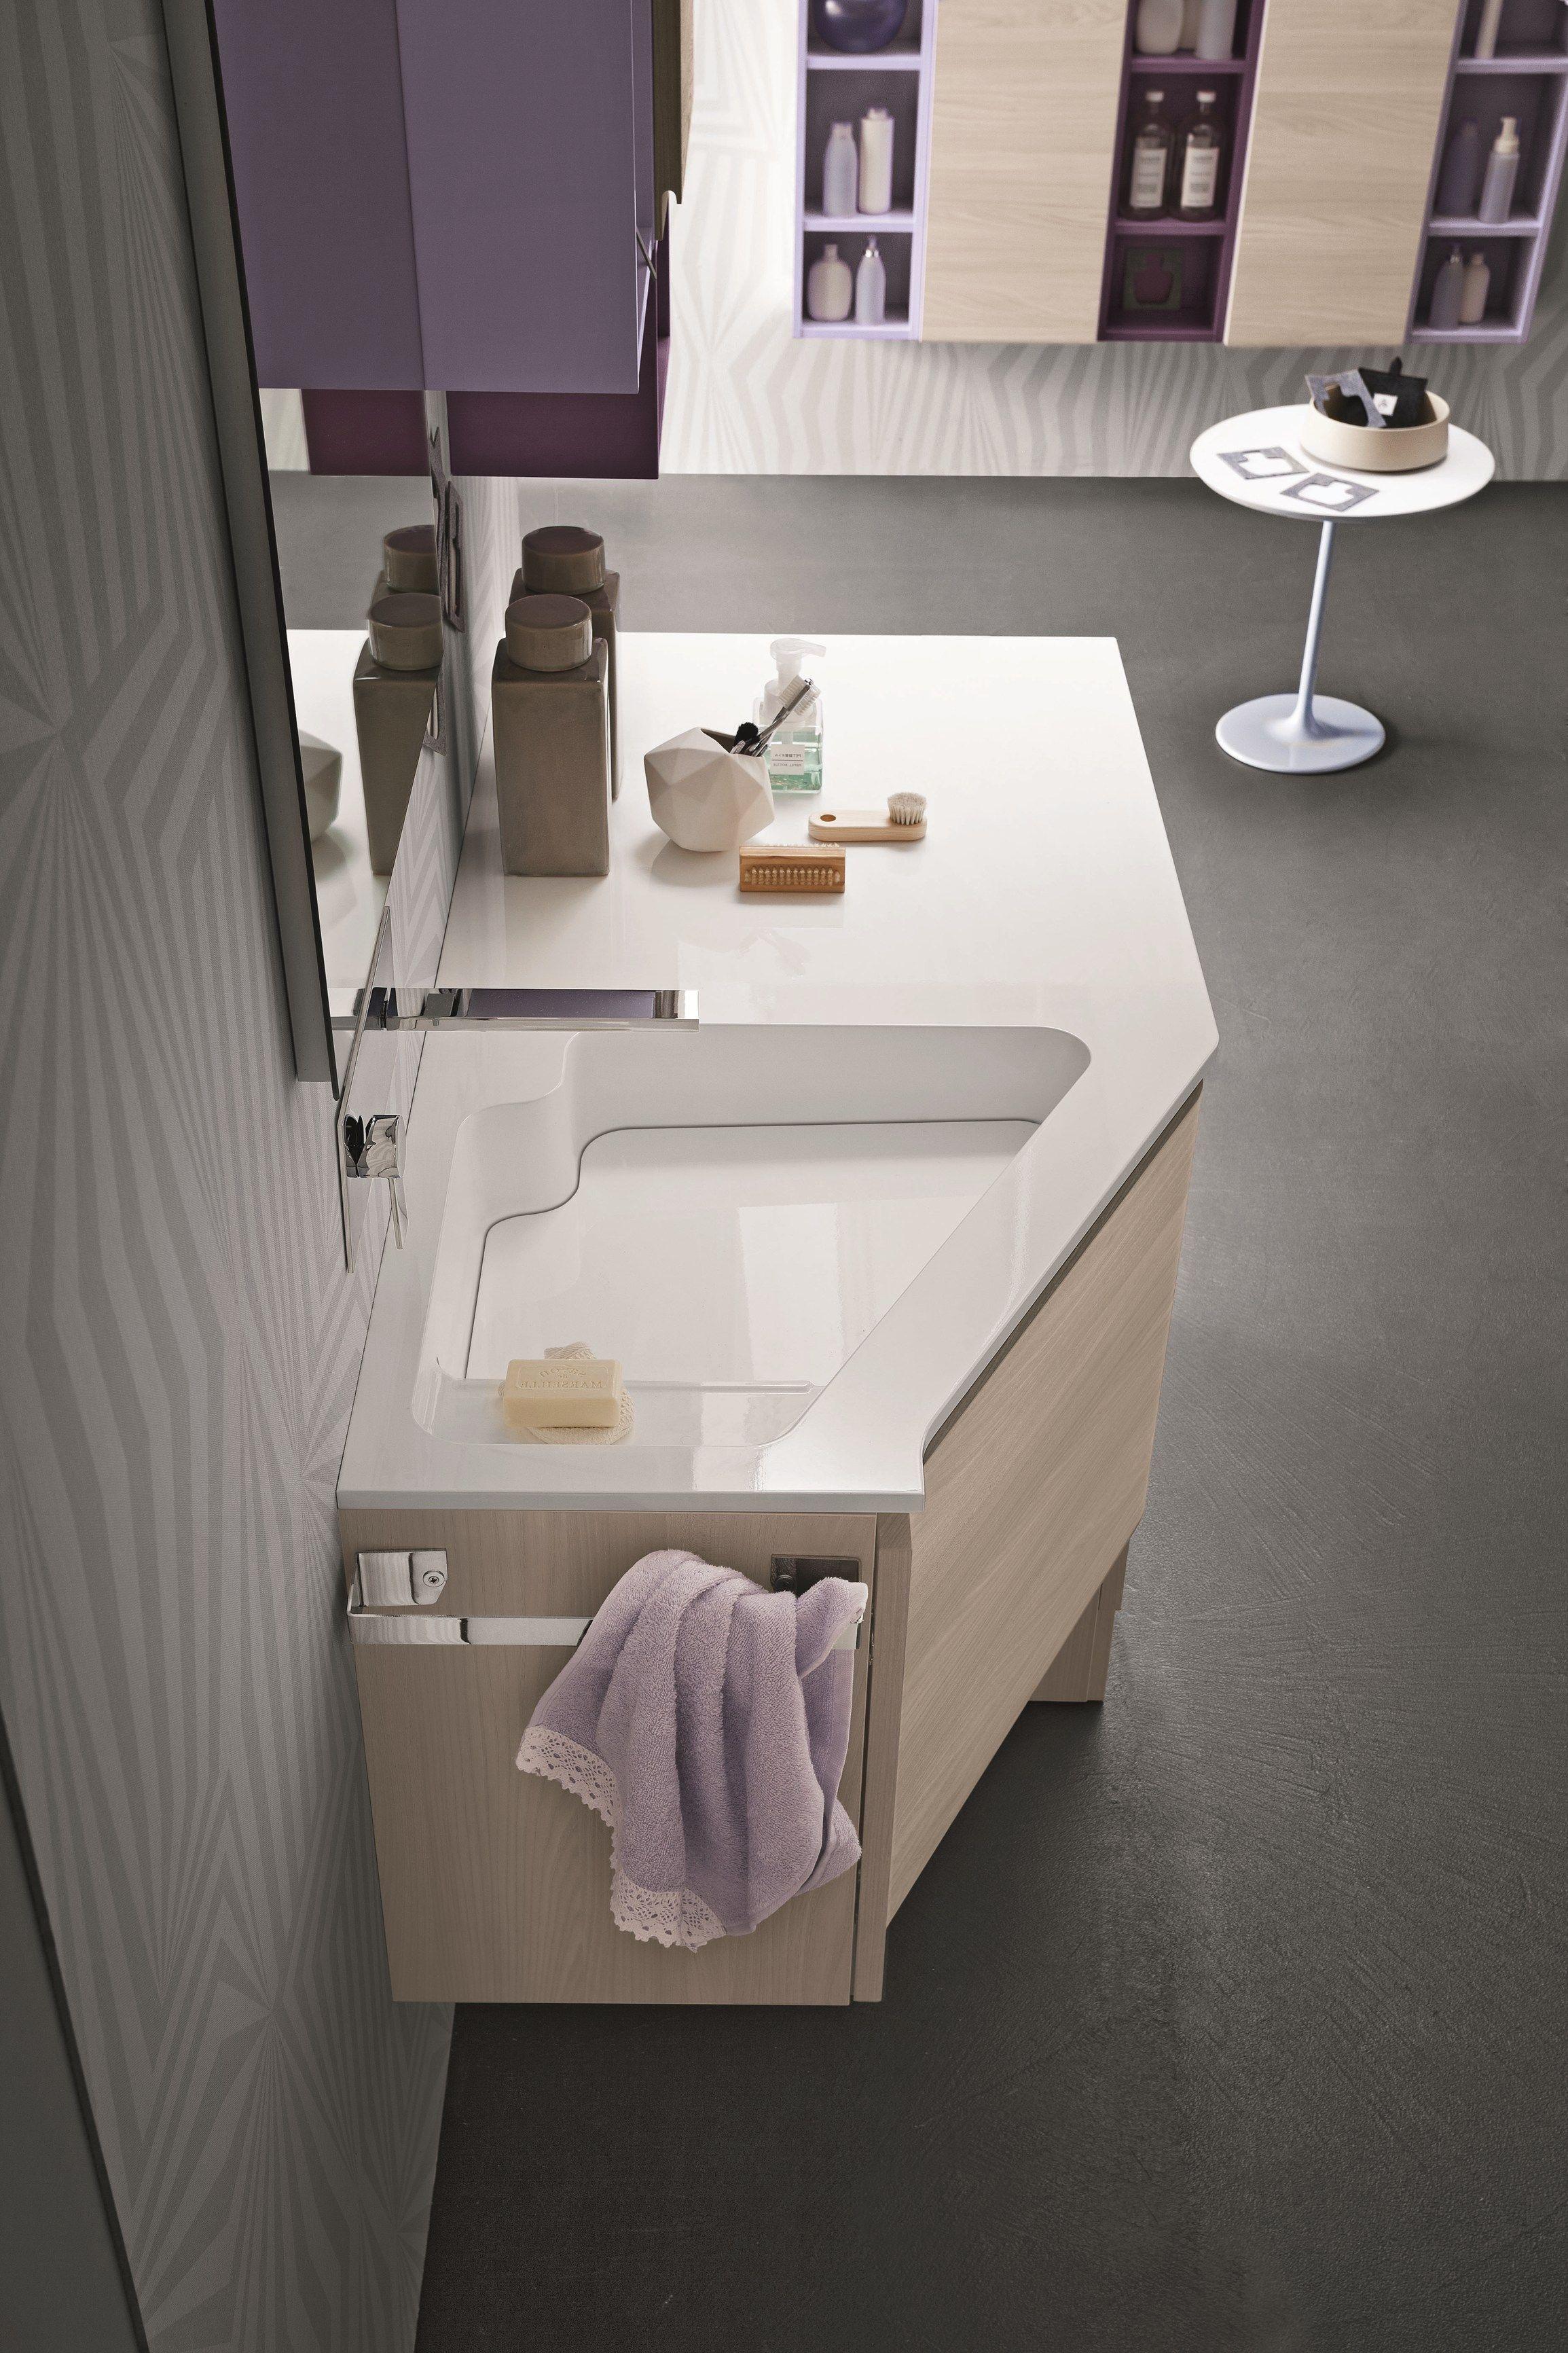 Arredo bagno completo ab 6020 by rab arredobagno - Rab mobili bagno ...